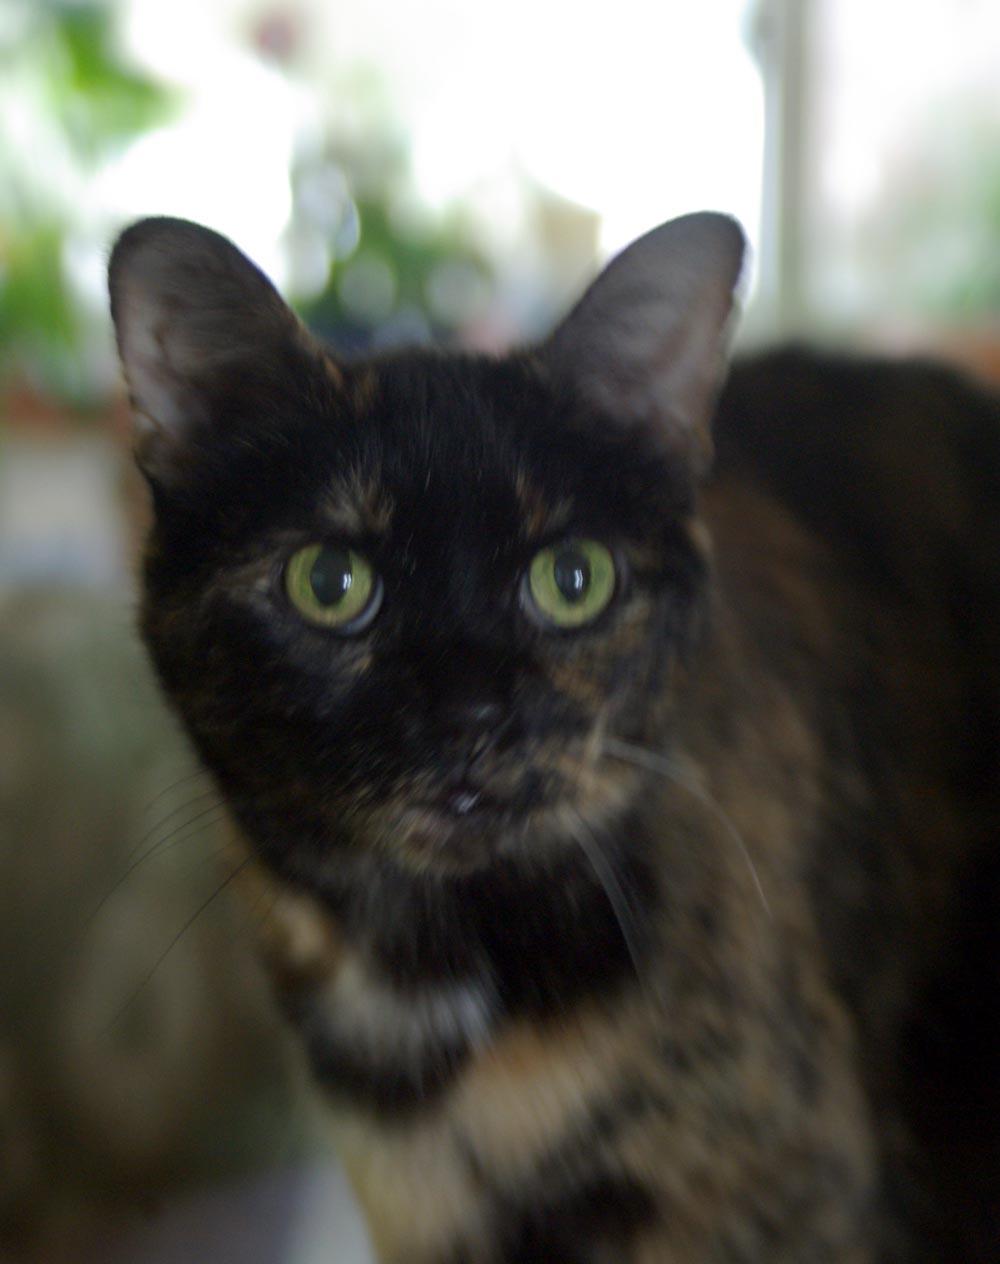 tortoiseshell cat with green eyes